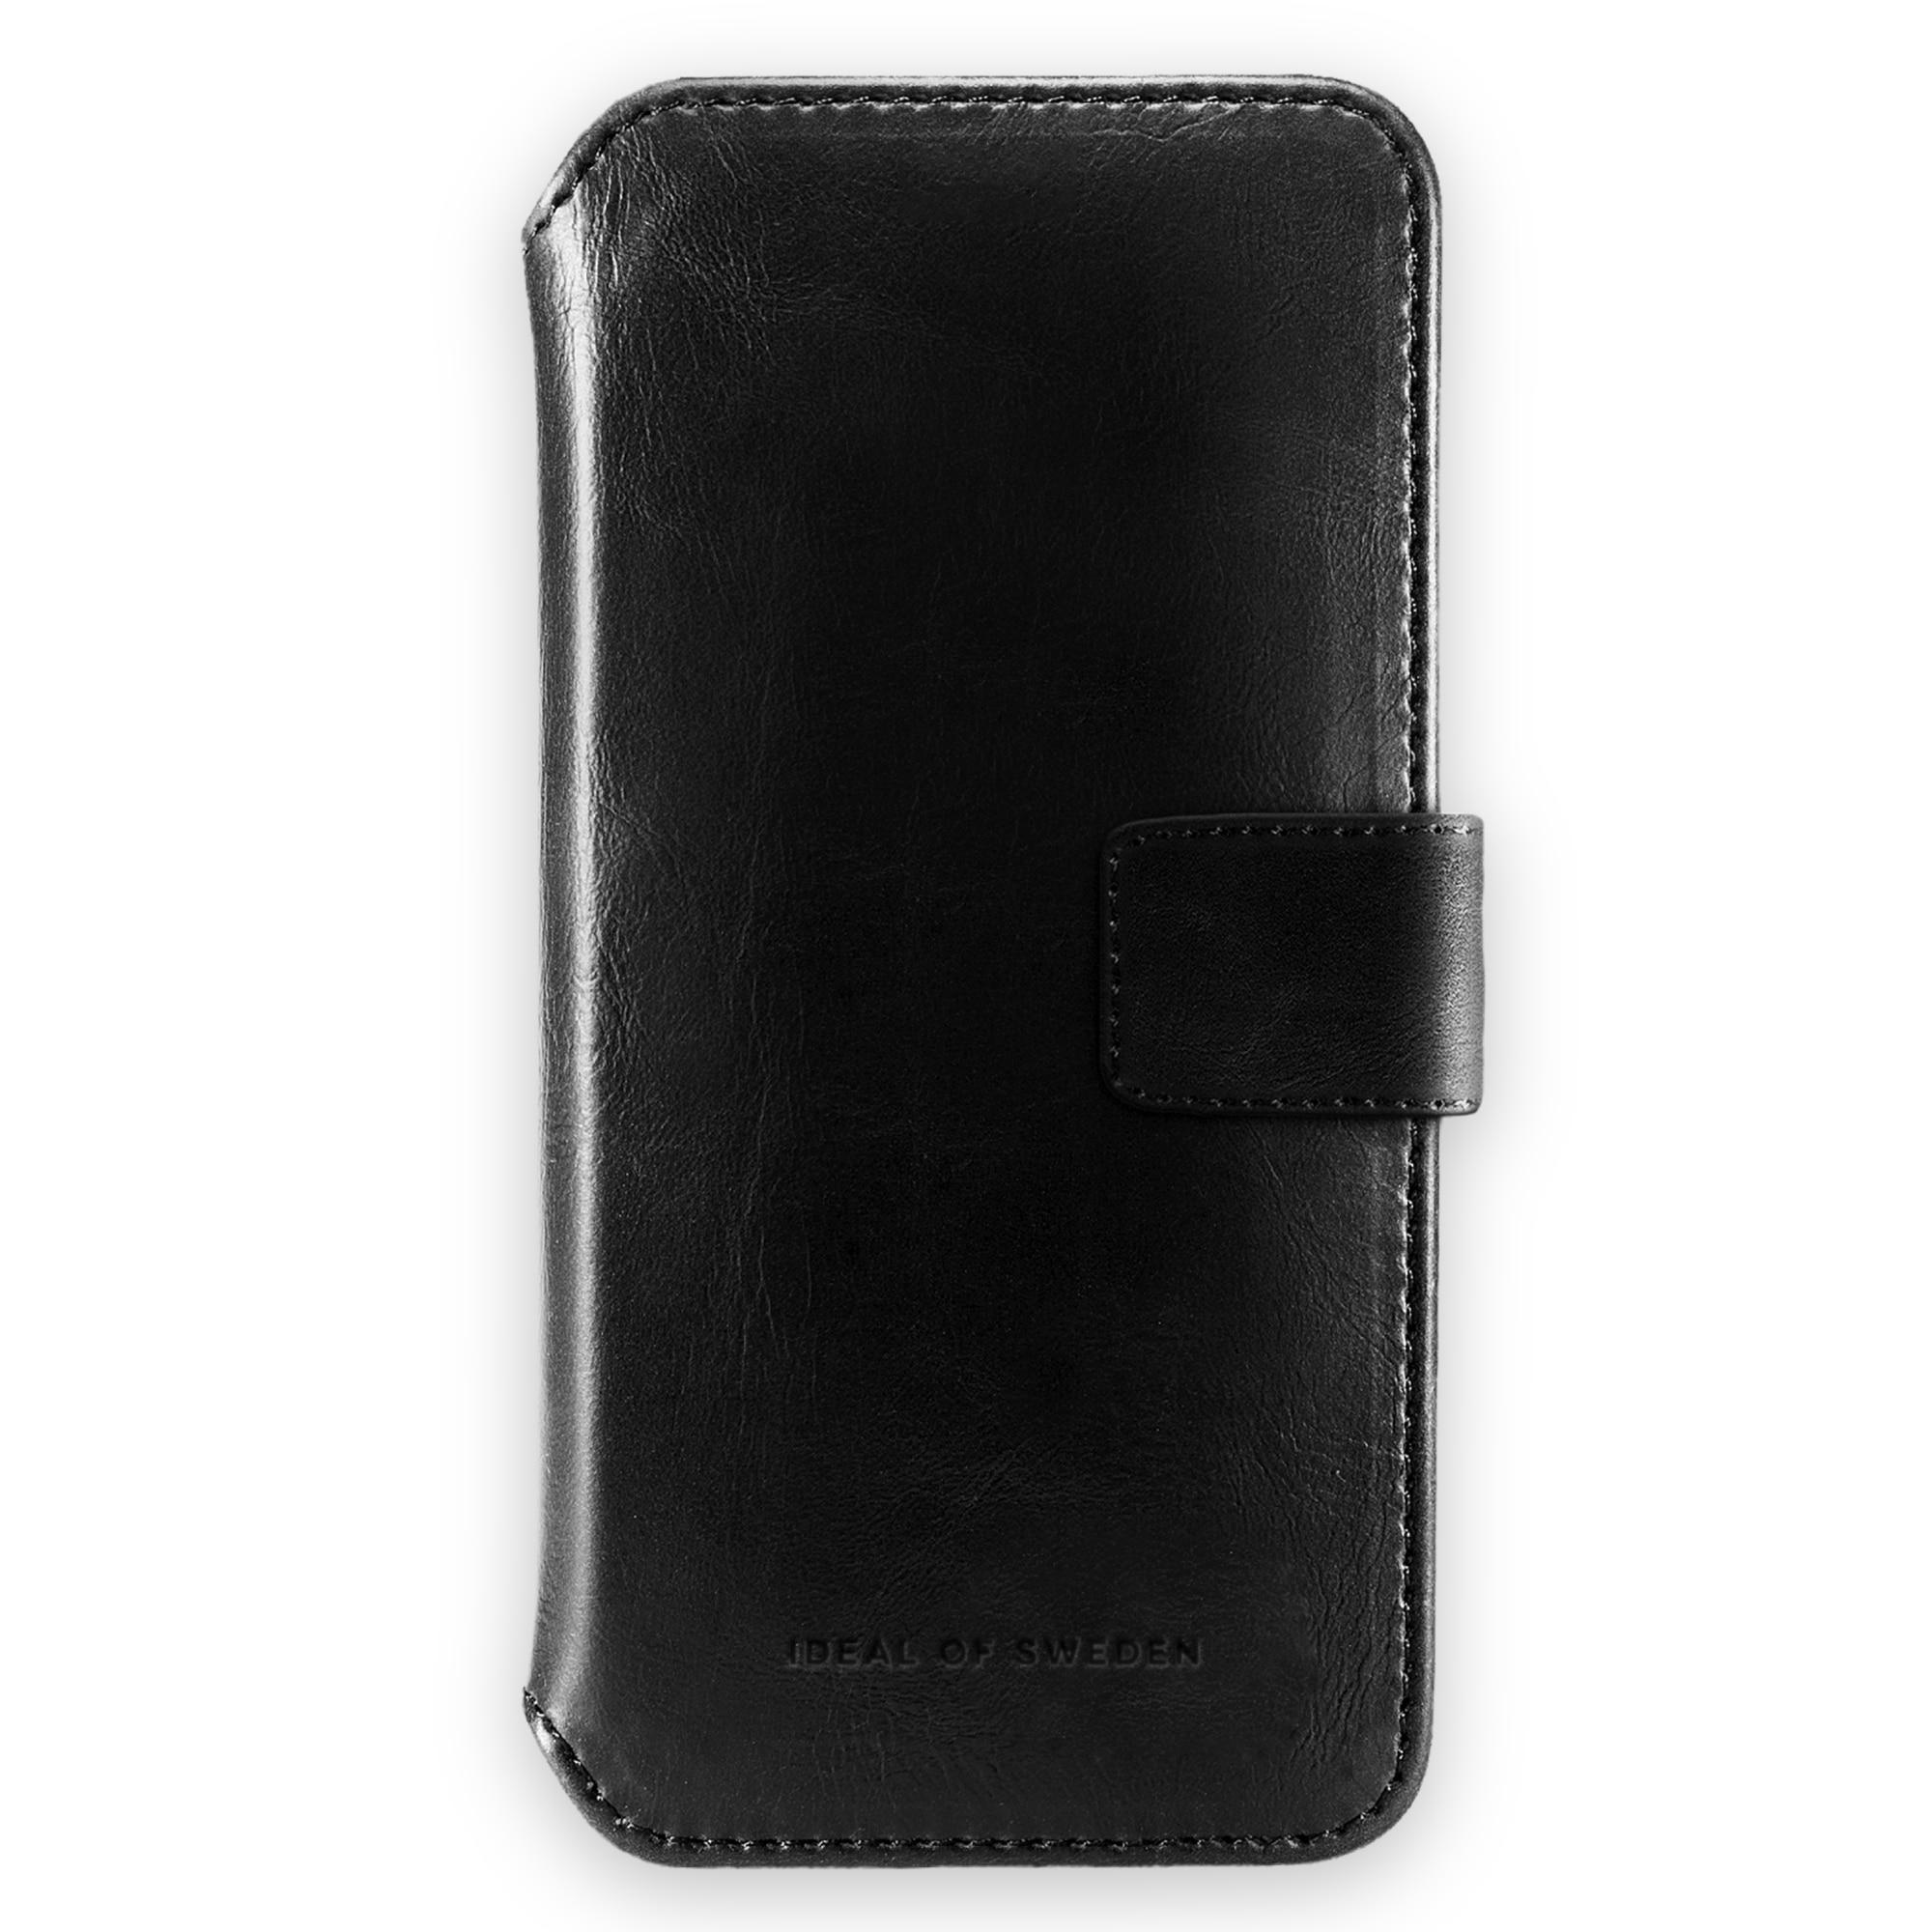 STHLM Wallet Galaxy S21 Ultra Black